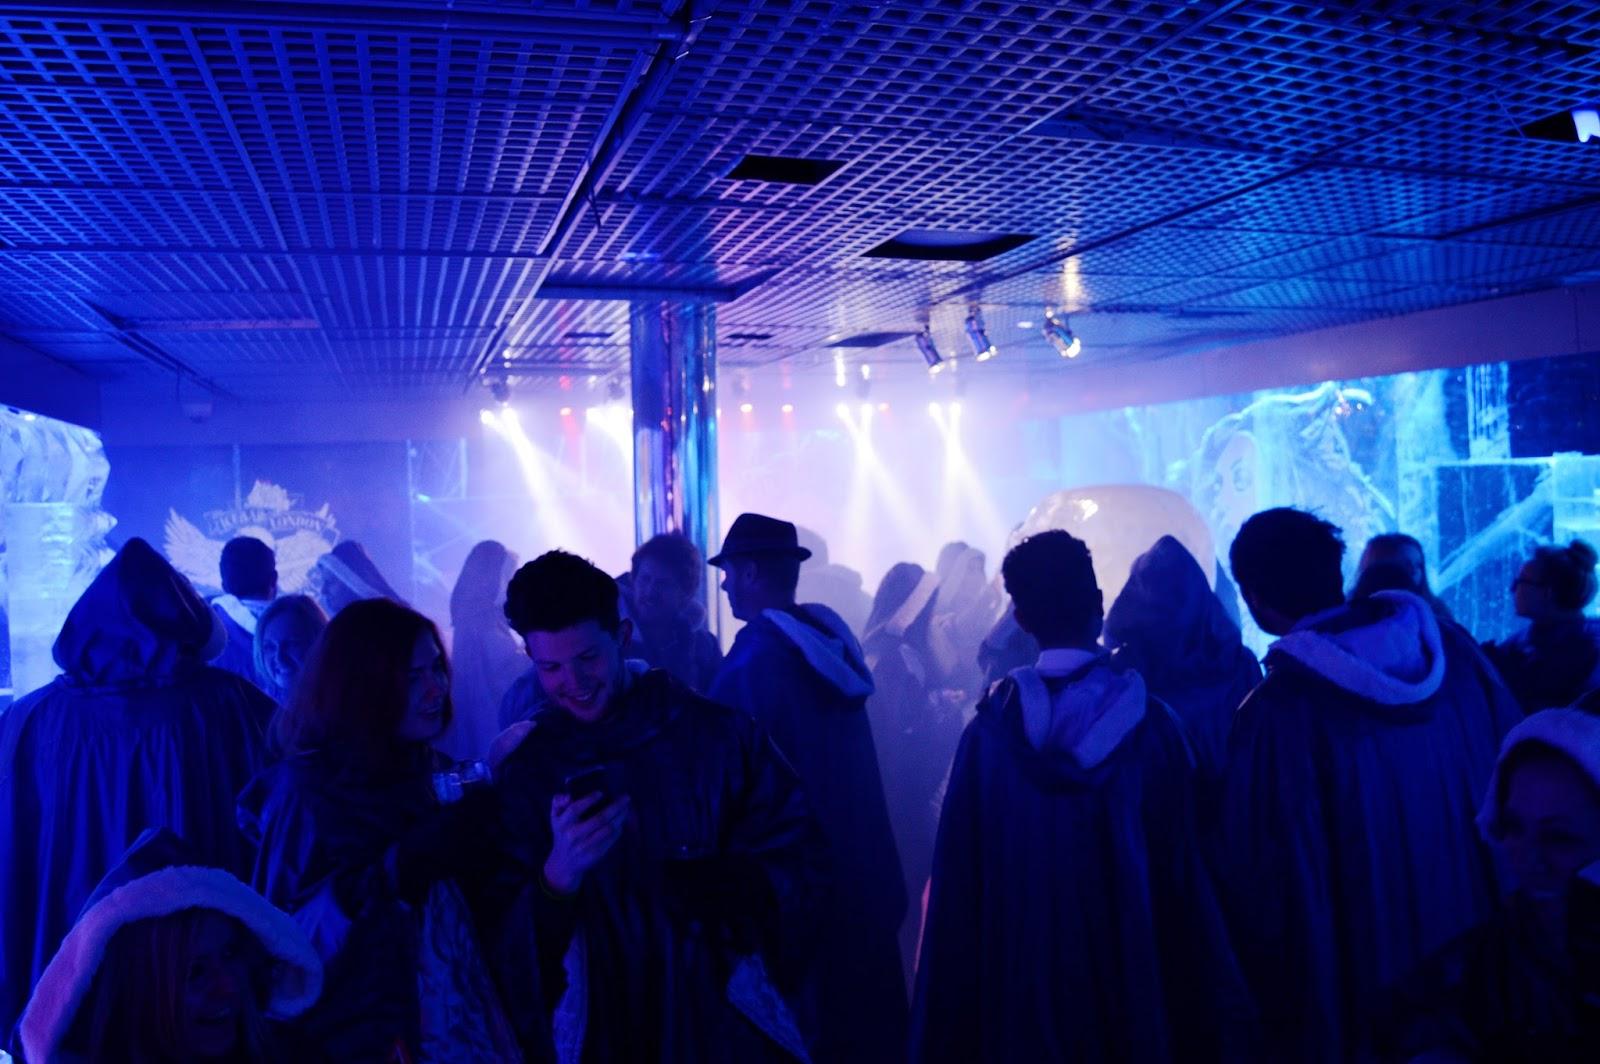 icebar london crowd